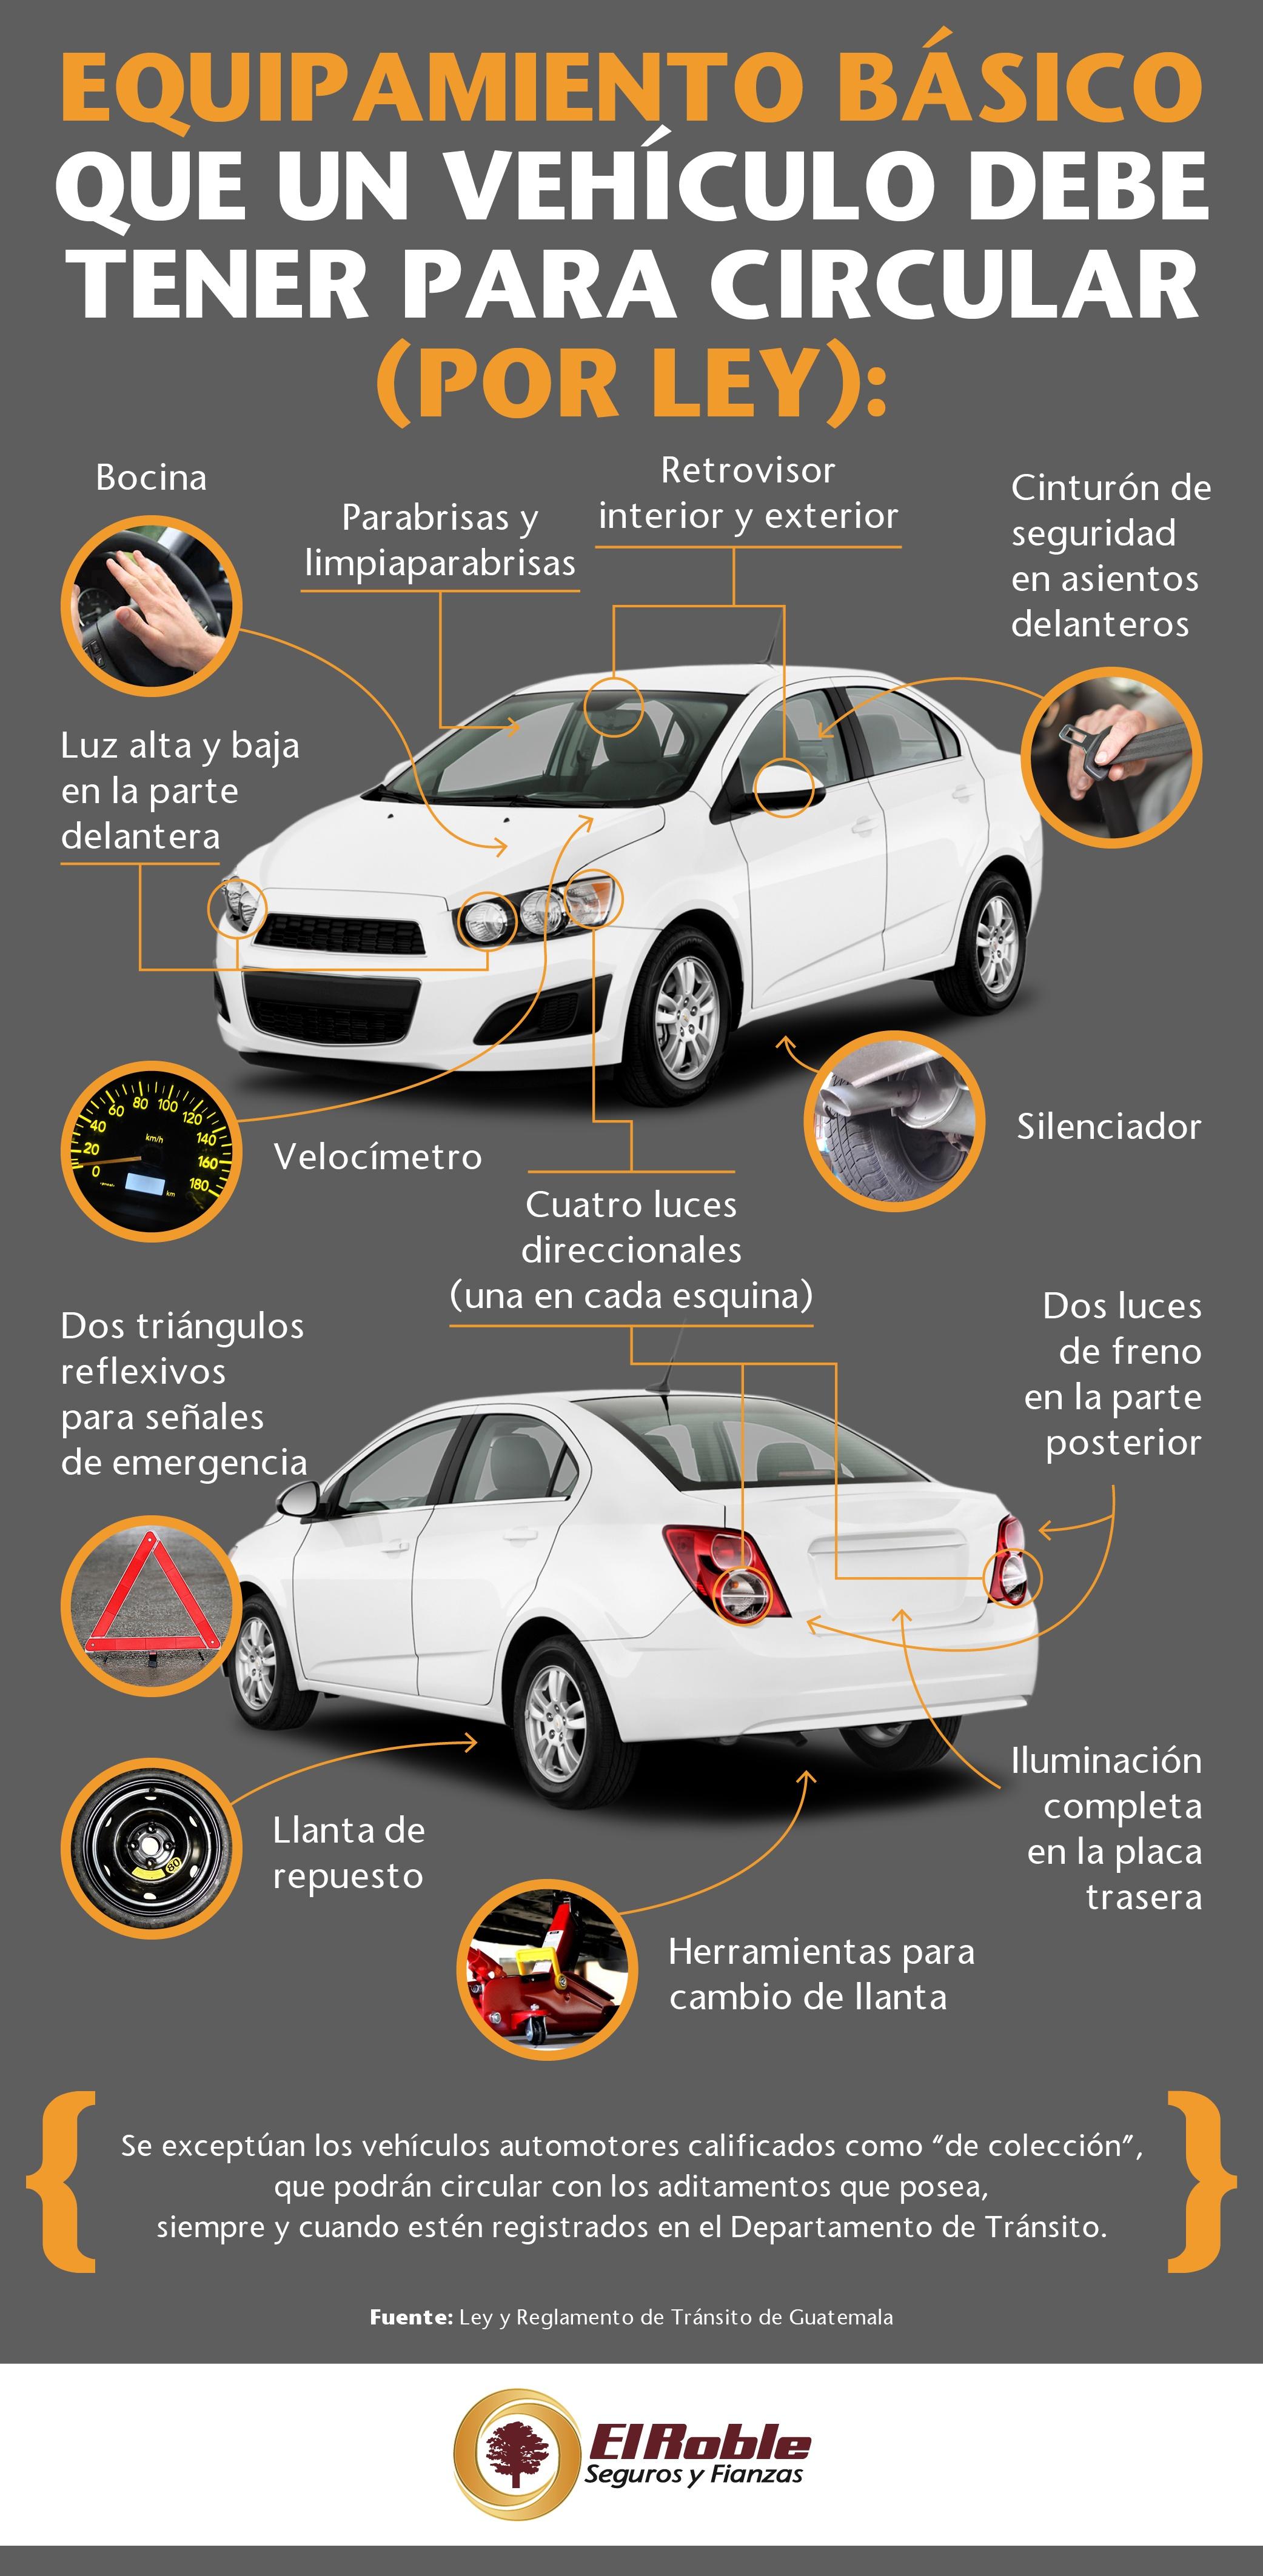 Infografia_5_equipamiento_basico_de_vehiculos